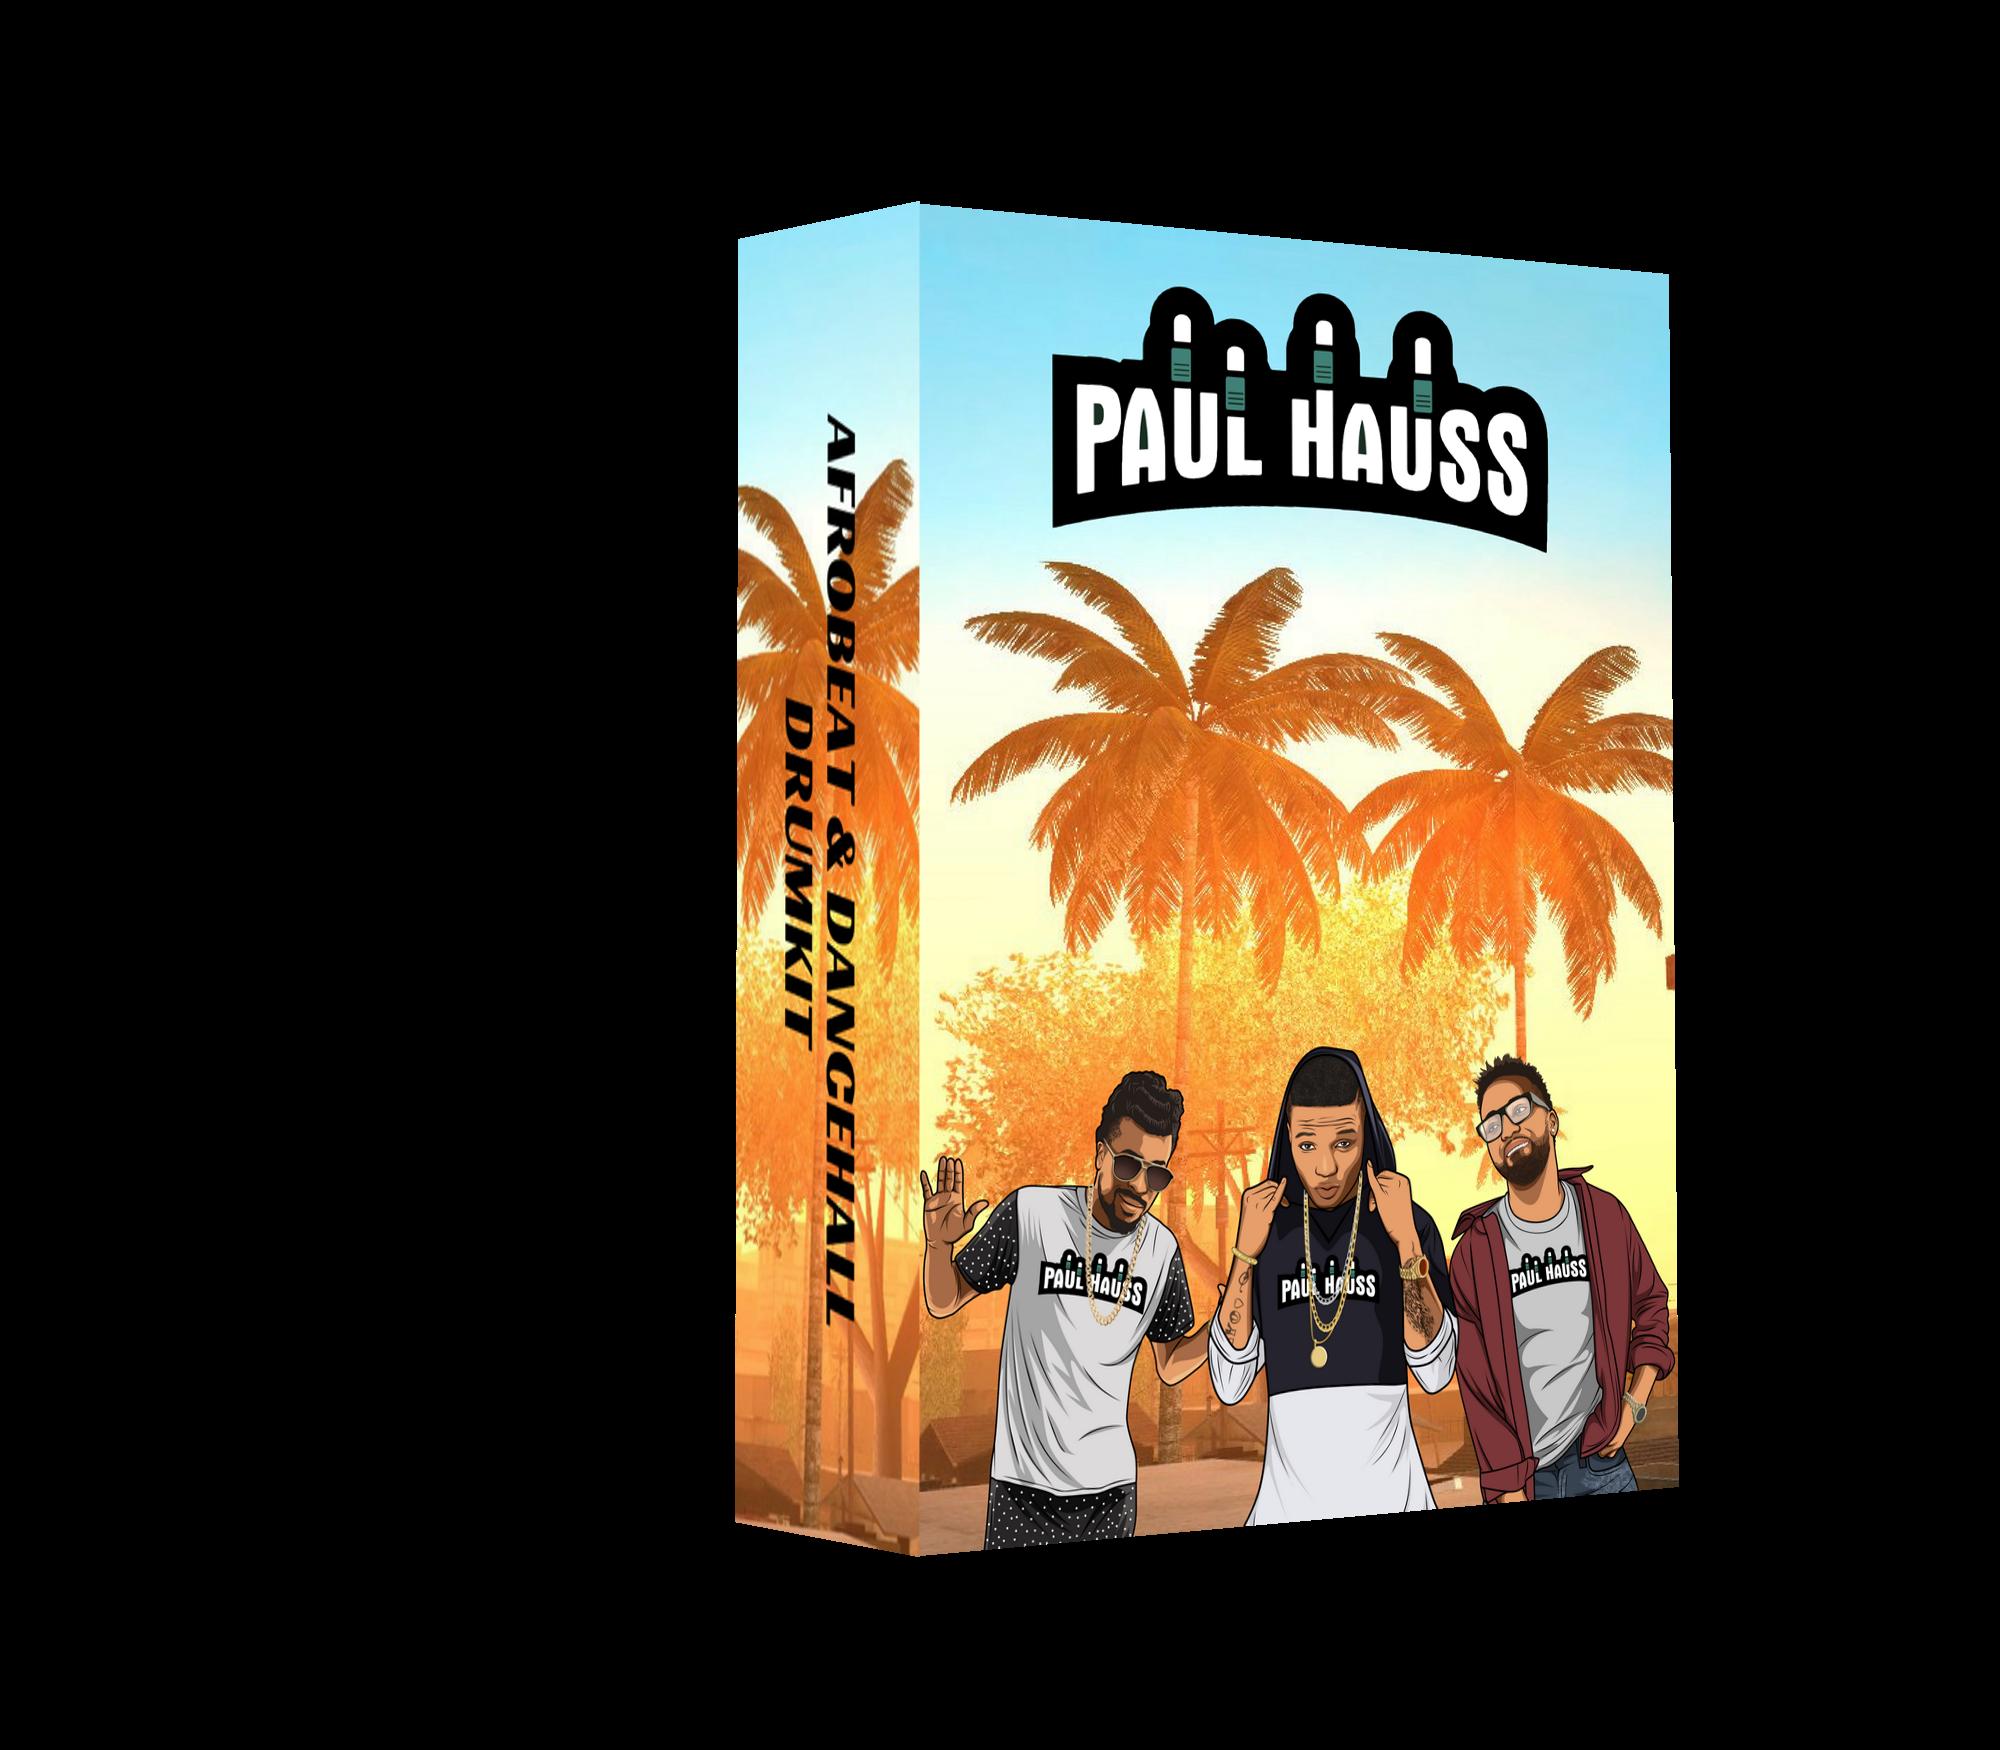 Paul Hauss Afrobeat & Dancehall Drumkit by Paul Hauss - Free